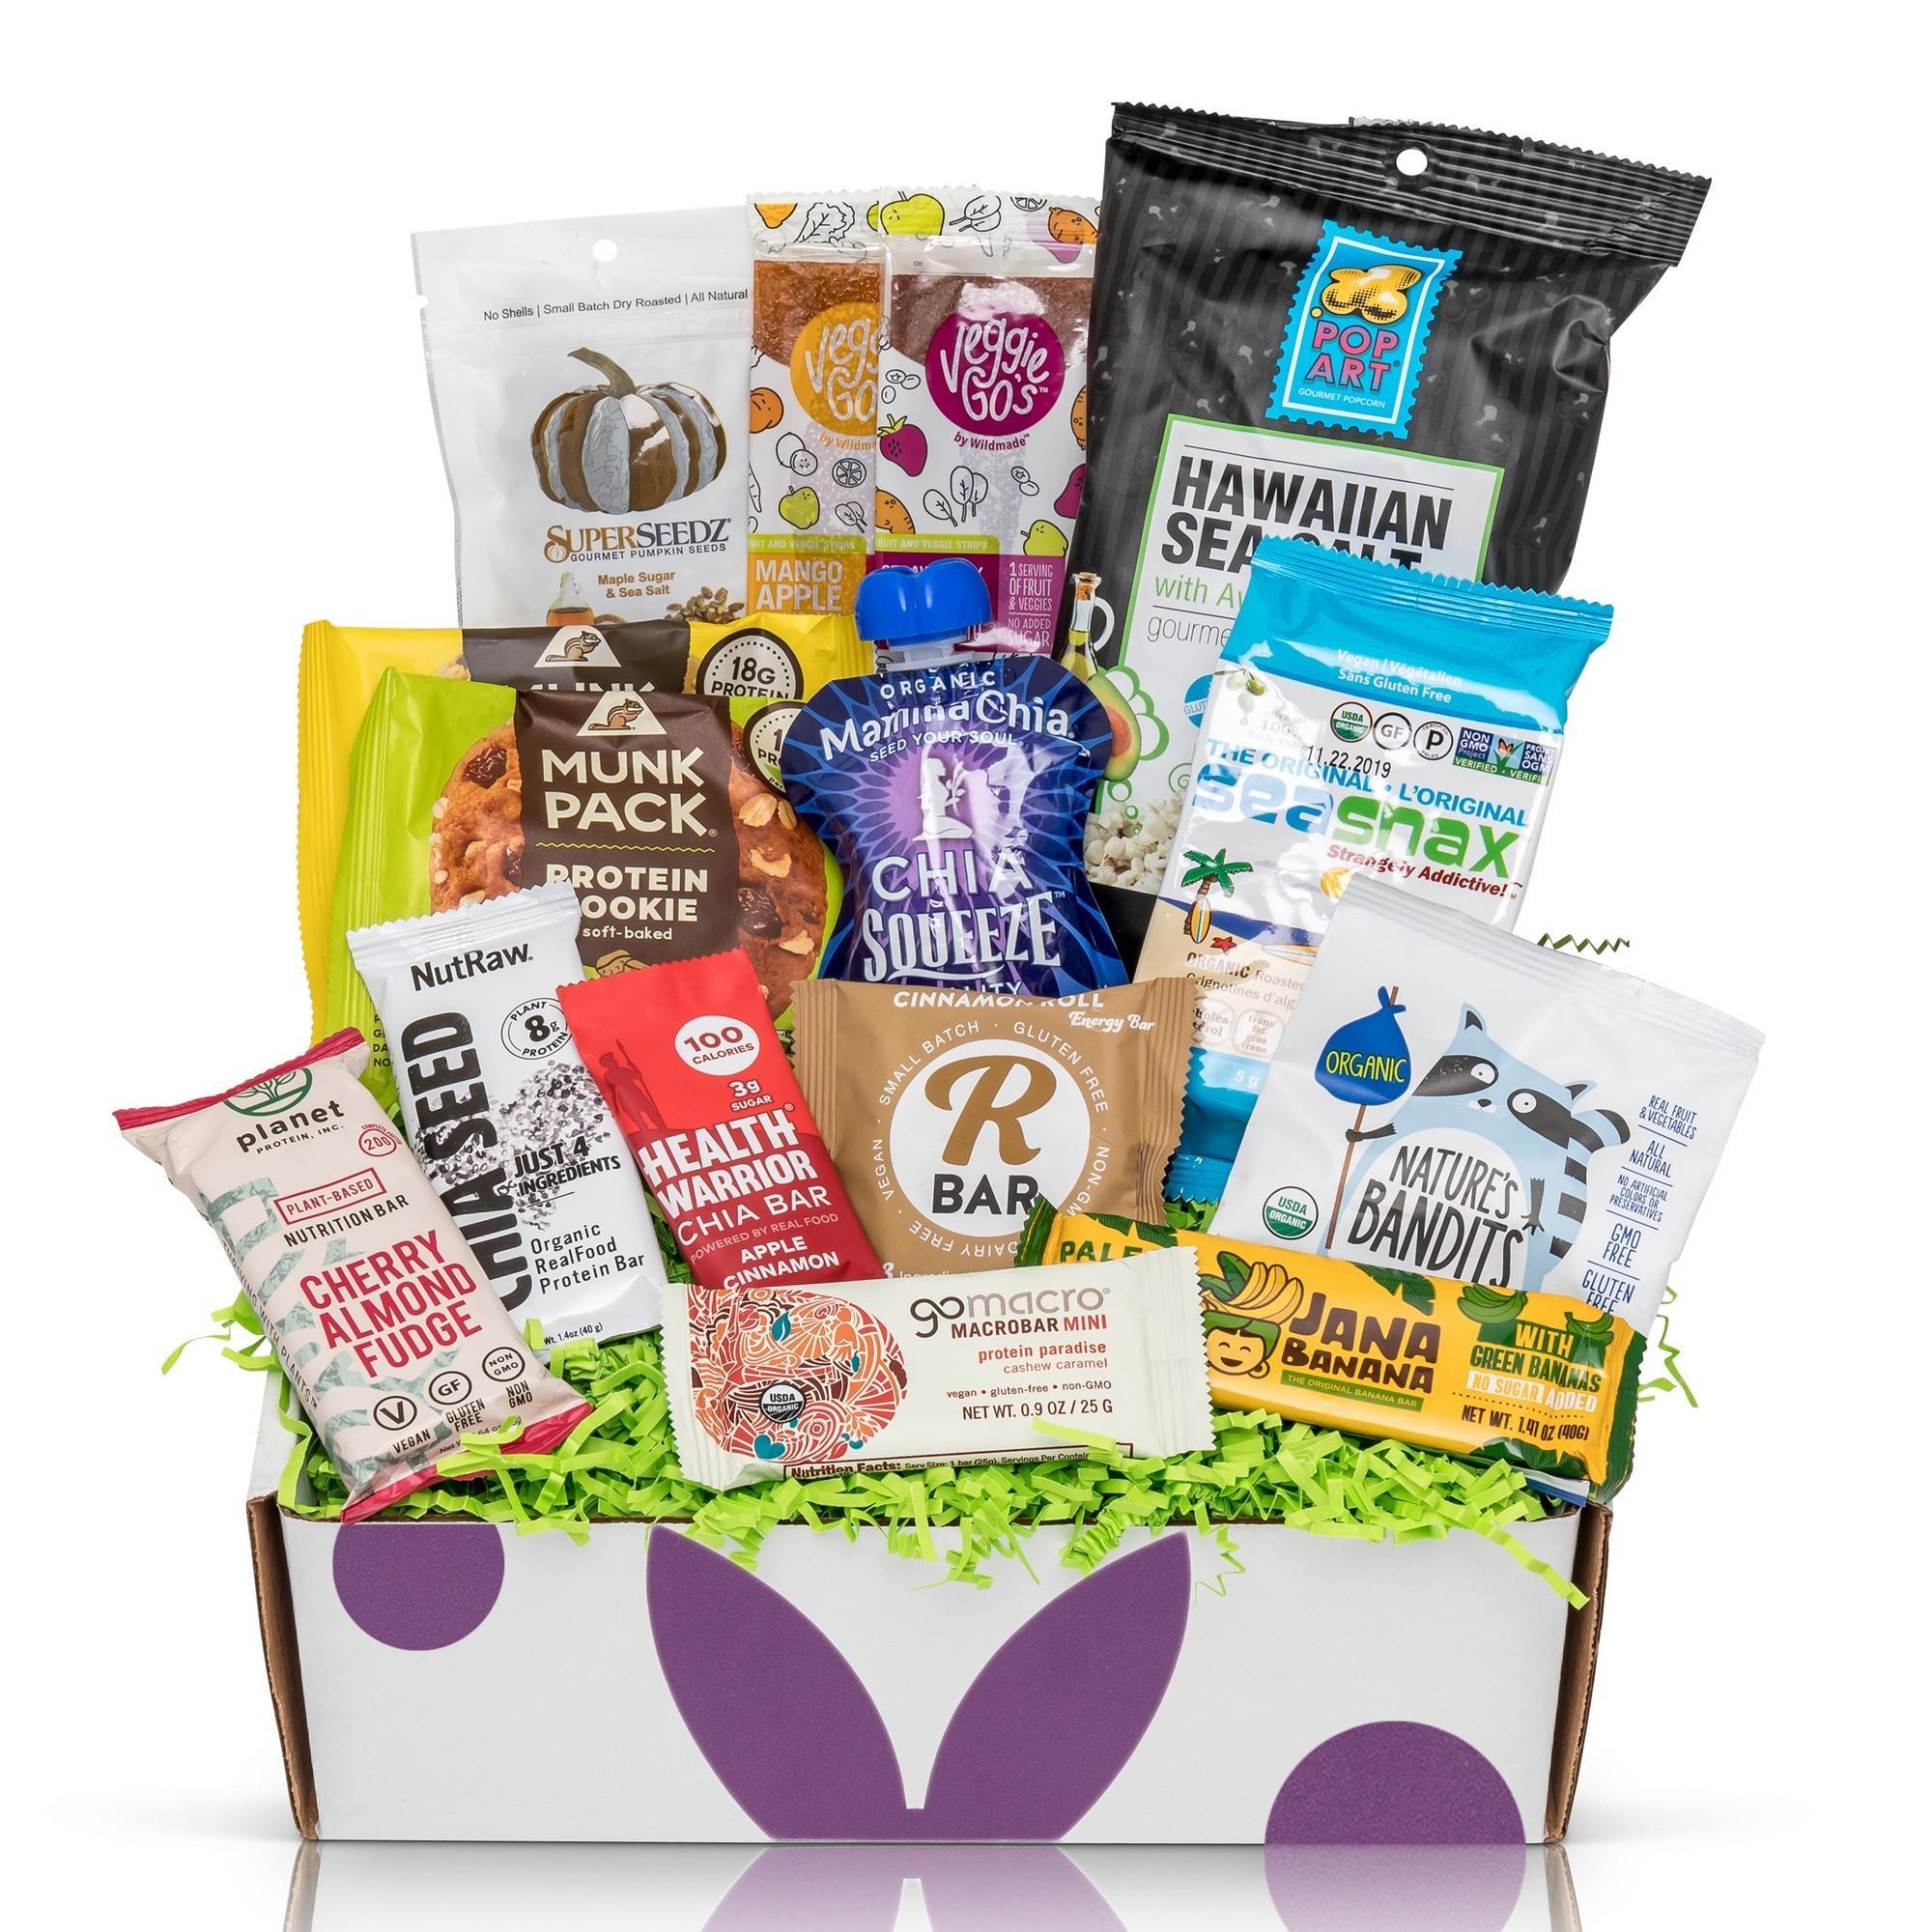 Bunny James Box - Hand Selected Premium Snacks Subscription: Vegan Gluten Free